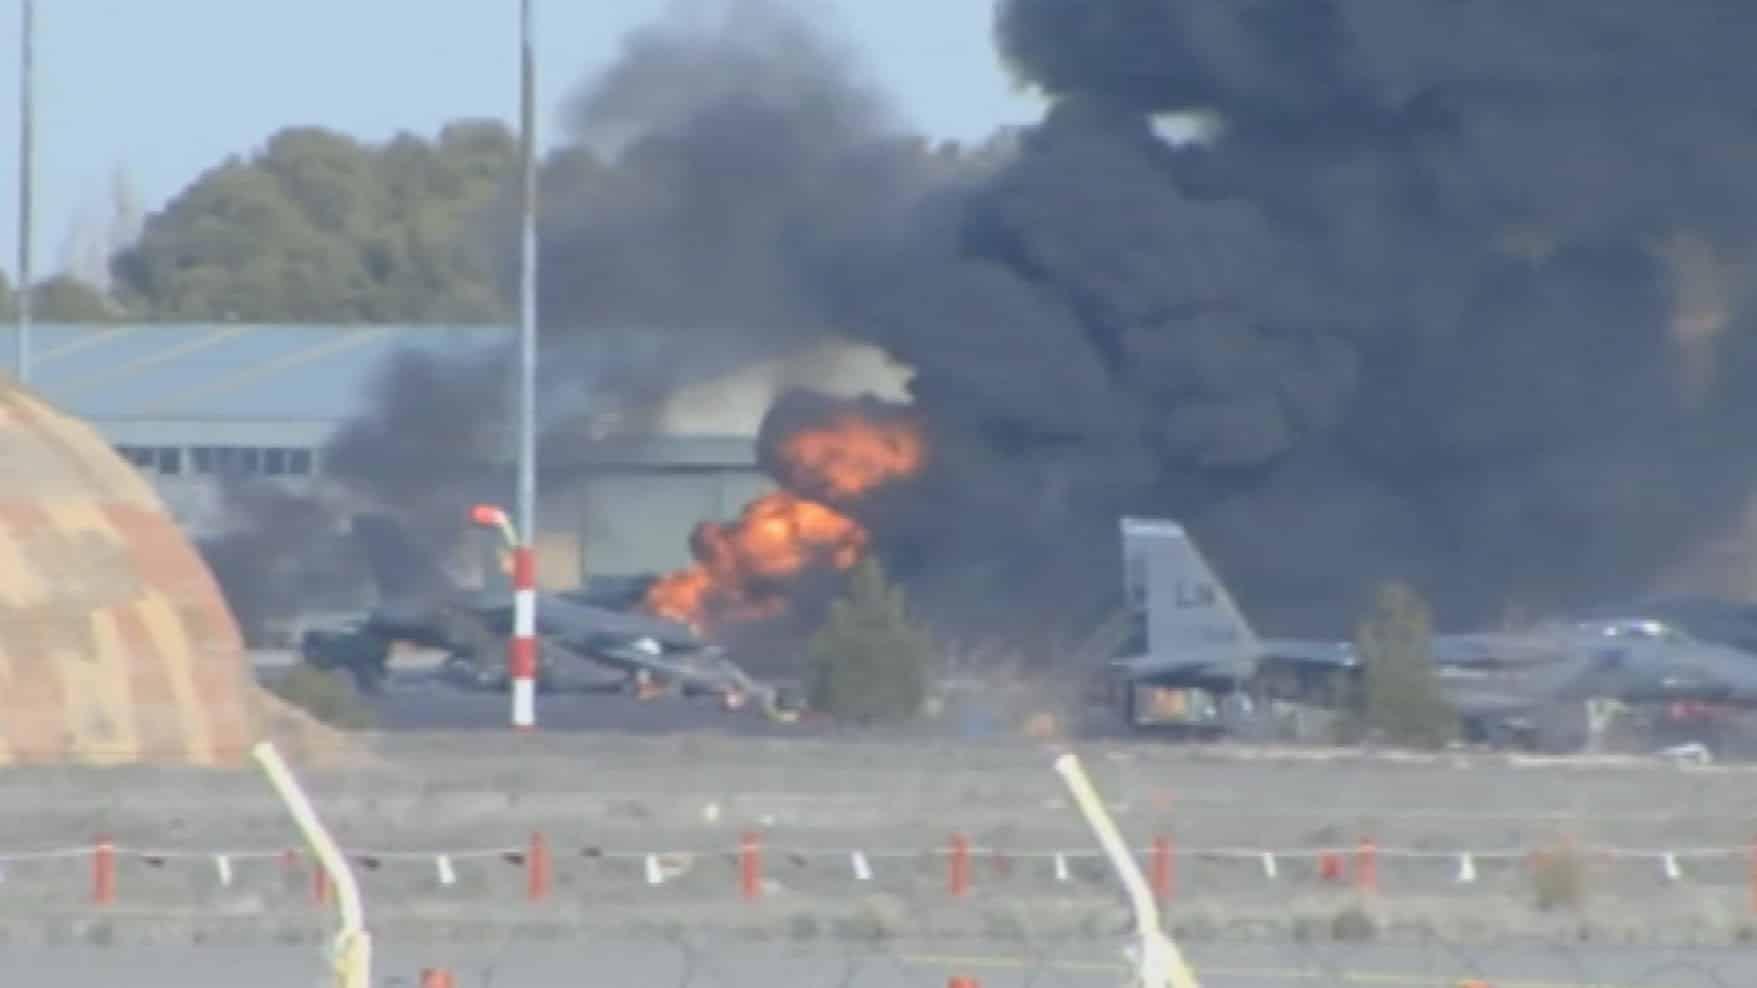 F-16: Σαν σήμερα 26 Ιανουαρίου η αεροπορική τραγωδία στο Αλμπαθέτε